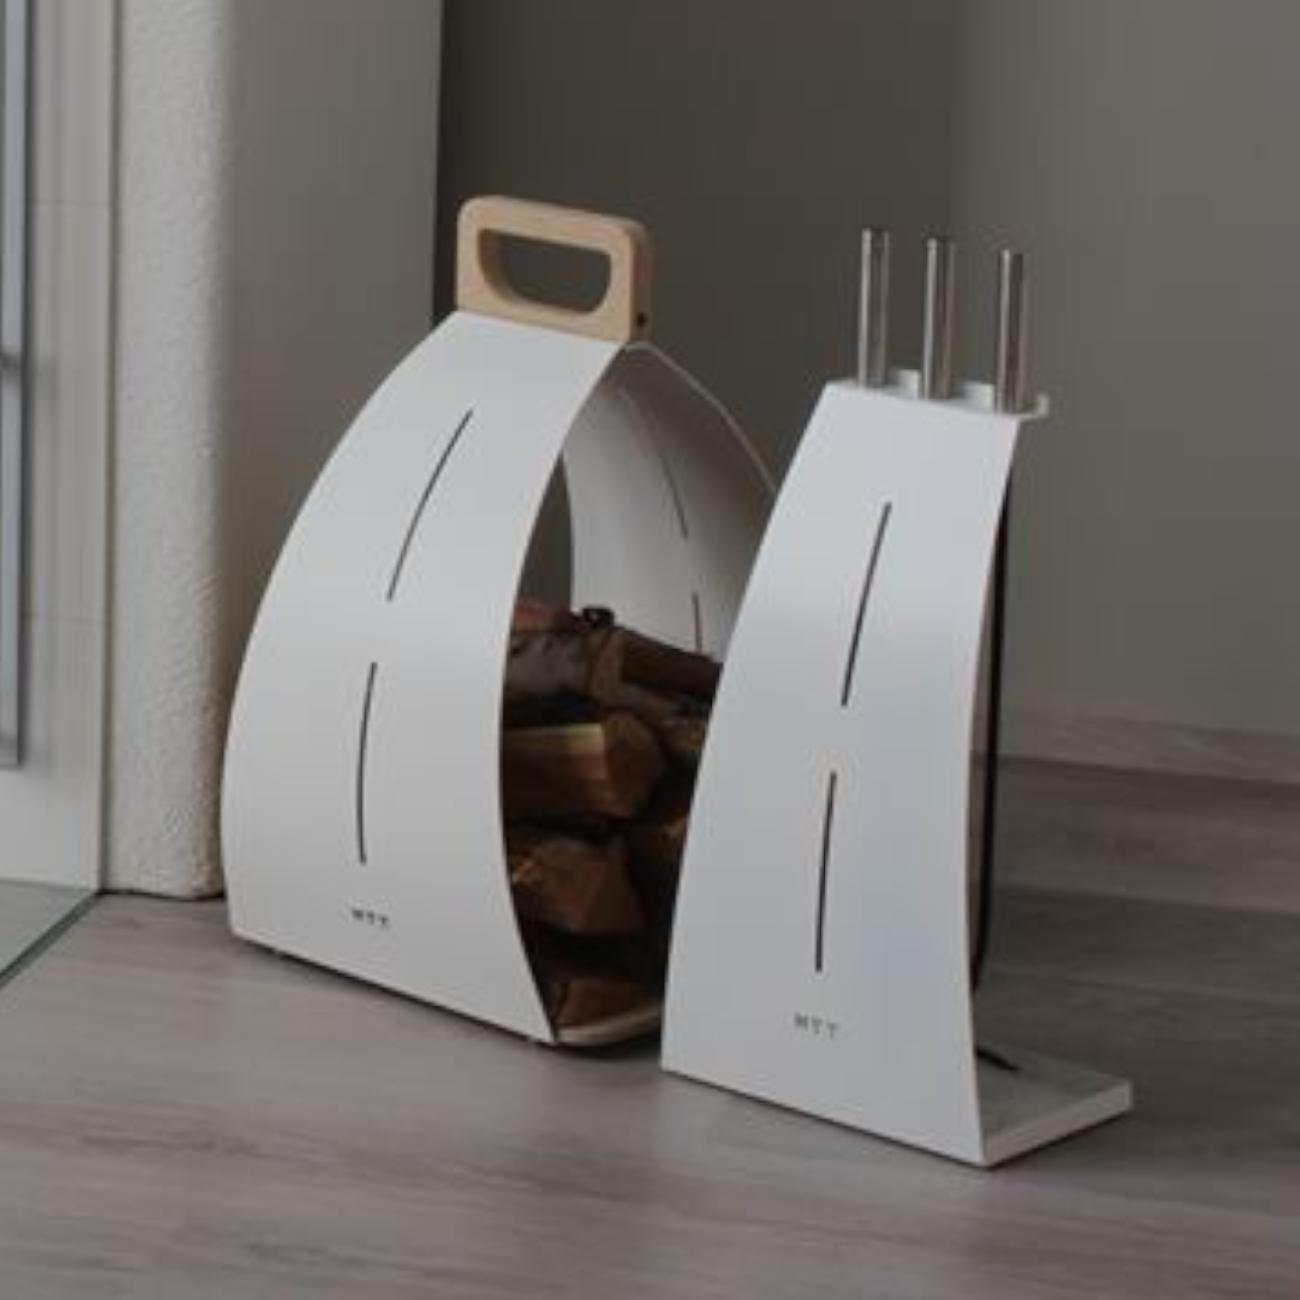 Pisla Design By Htt Kaminbesteck Kelo 4 Teilig Kaminbestecke Kaminzubehor Derofenfuchs Kamin Und Energiestudio